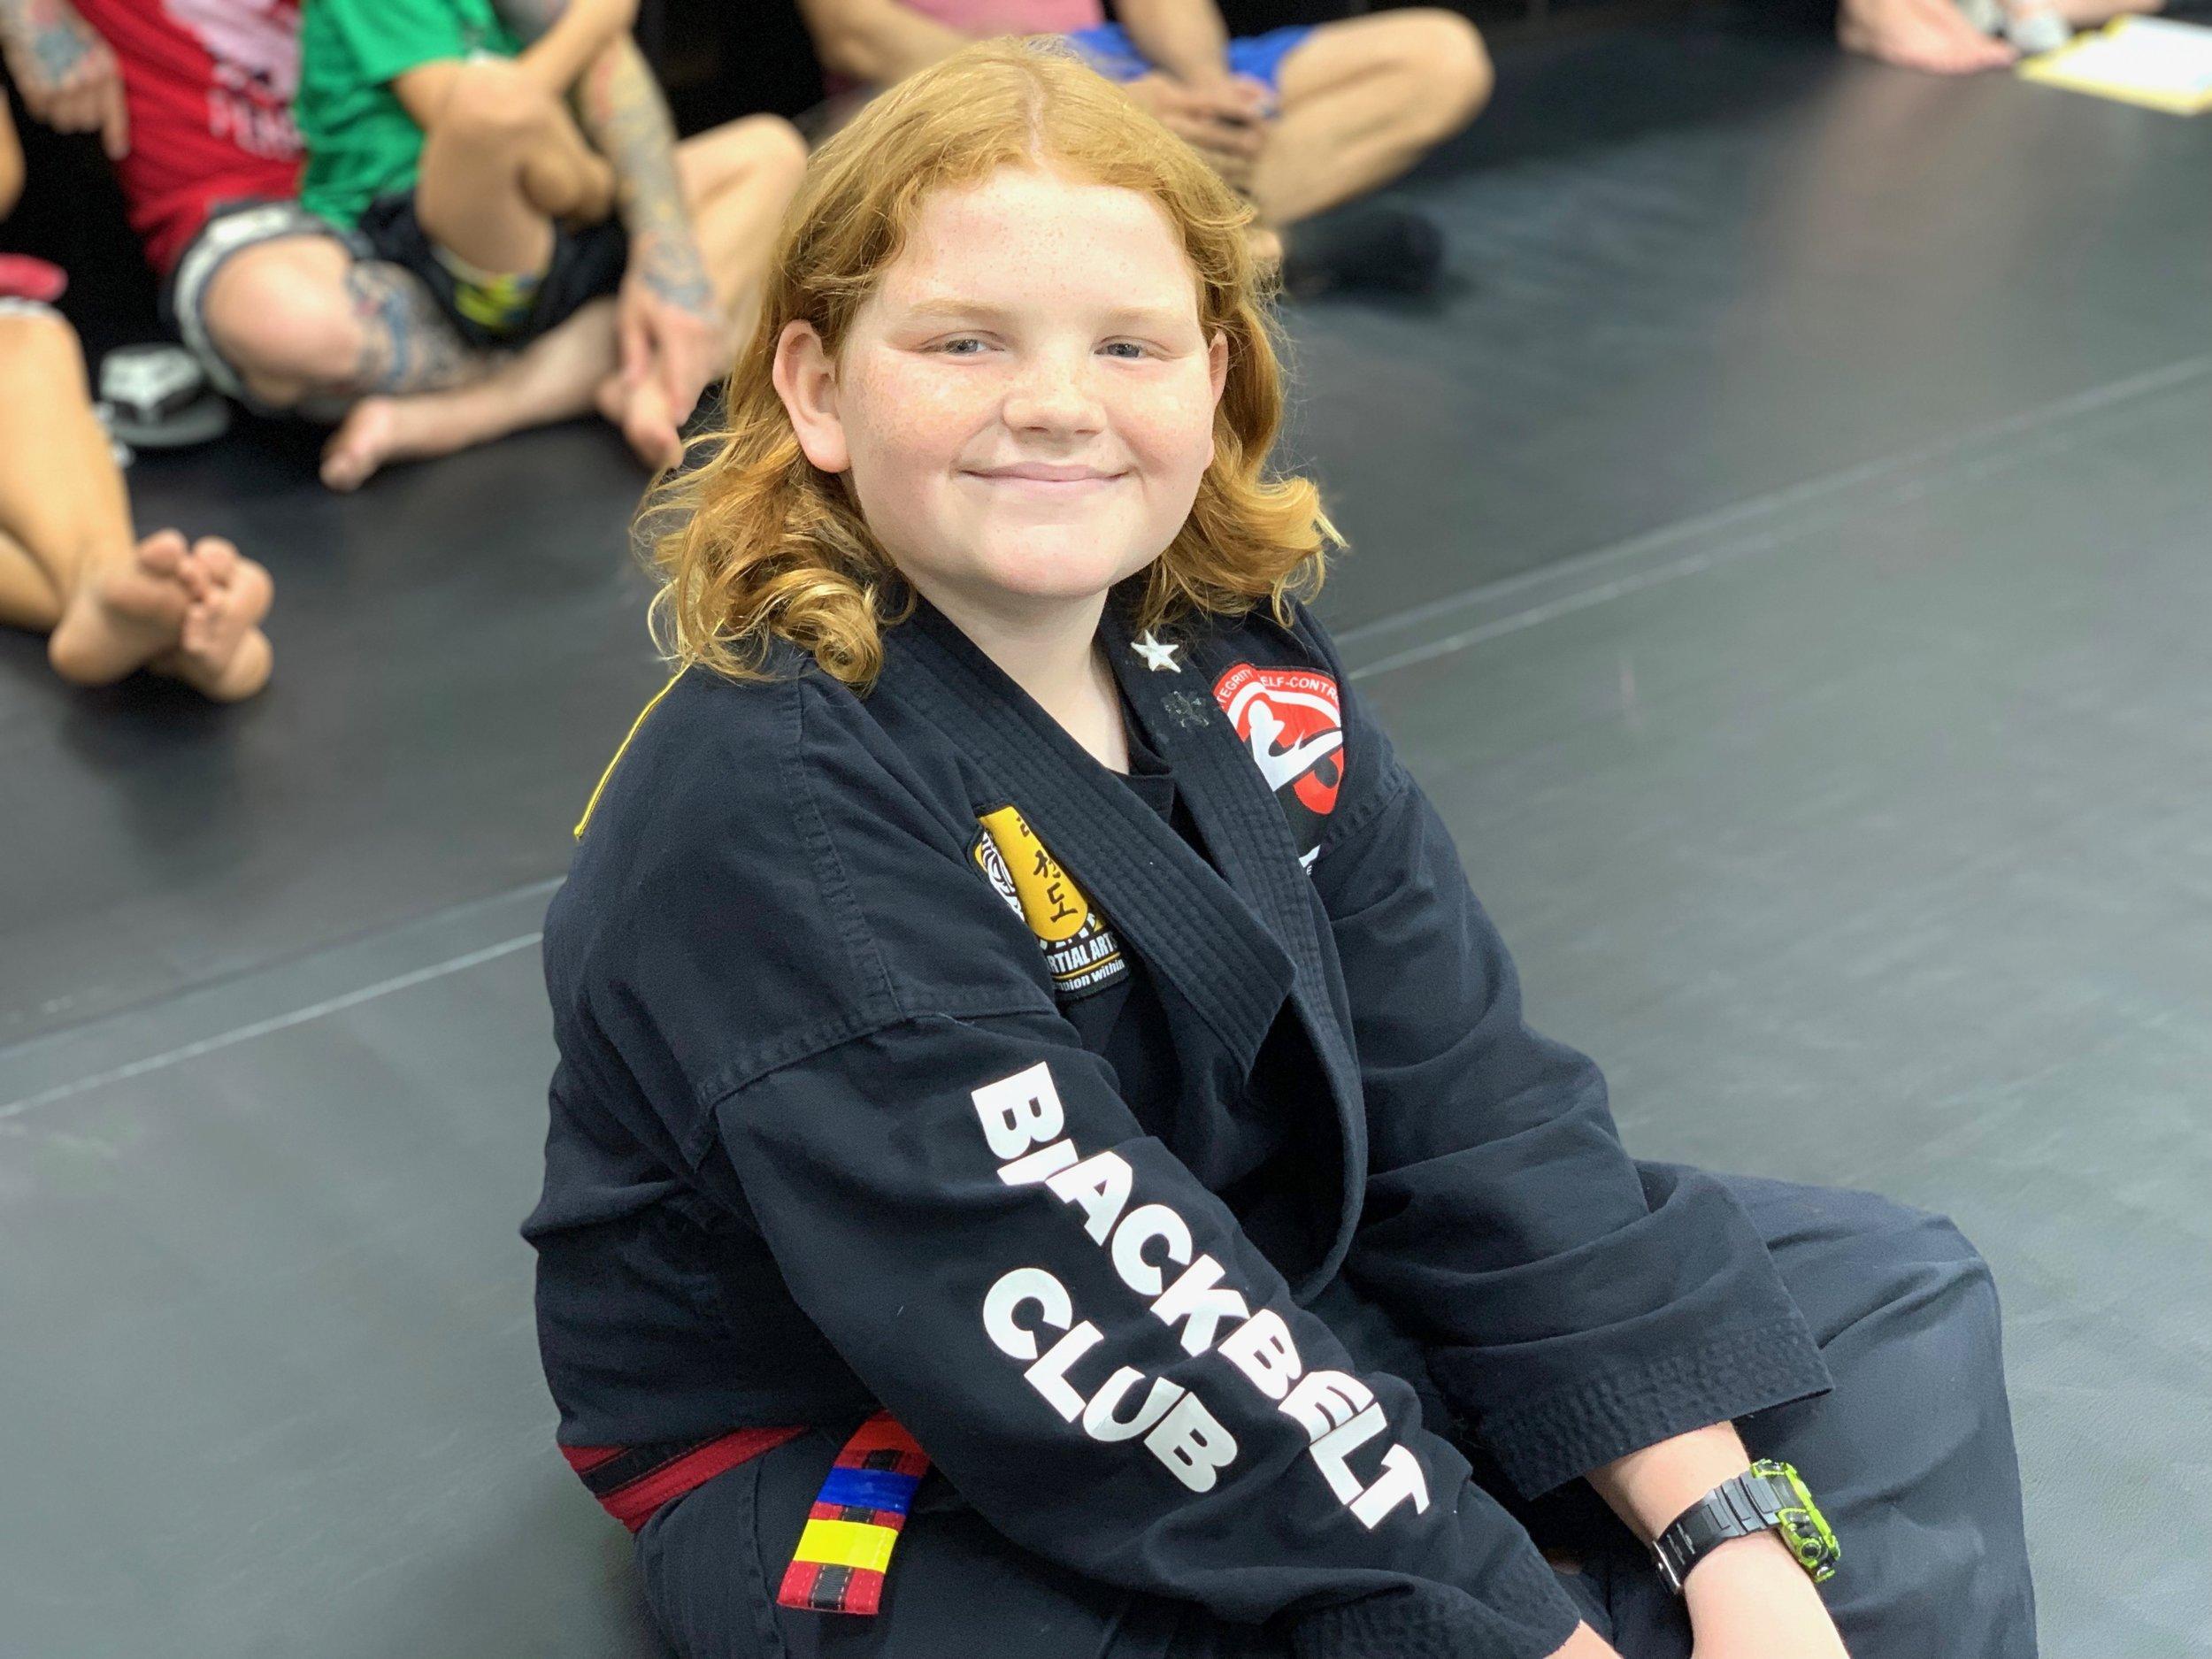 karate-kids-program-souhtlake-keller-grapevine-texas00008.jpeg